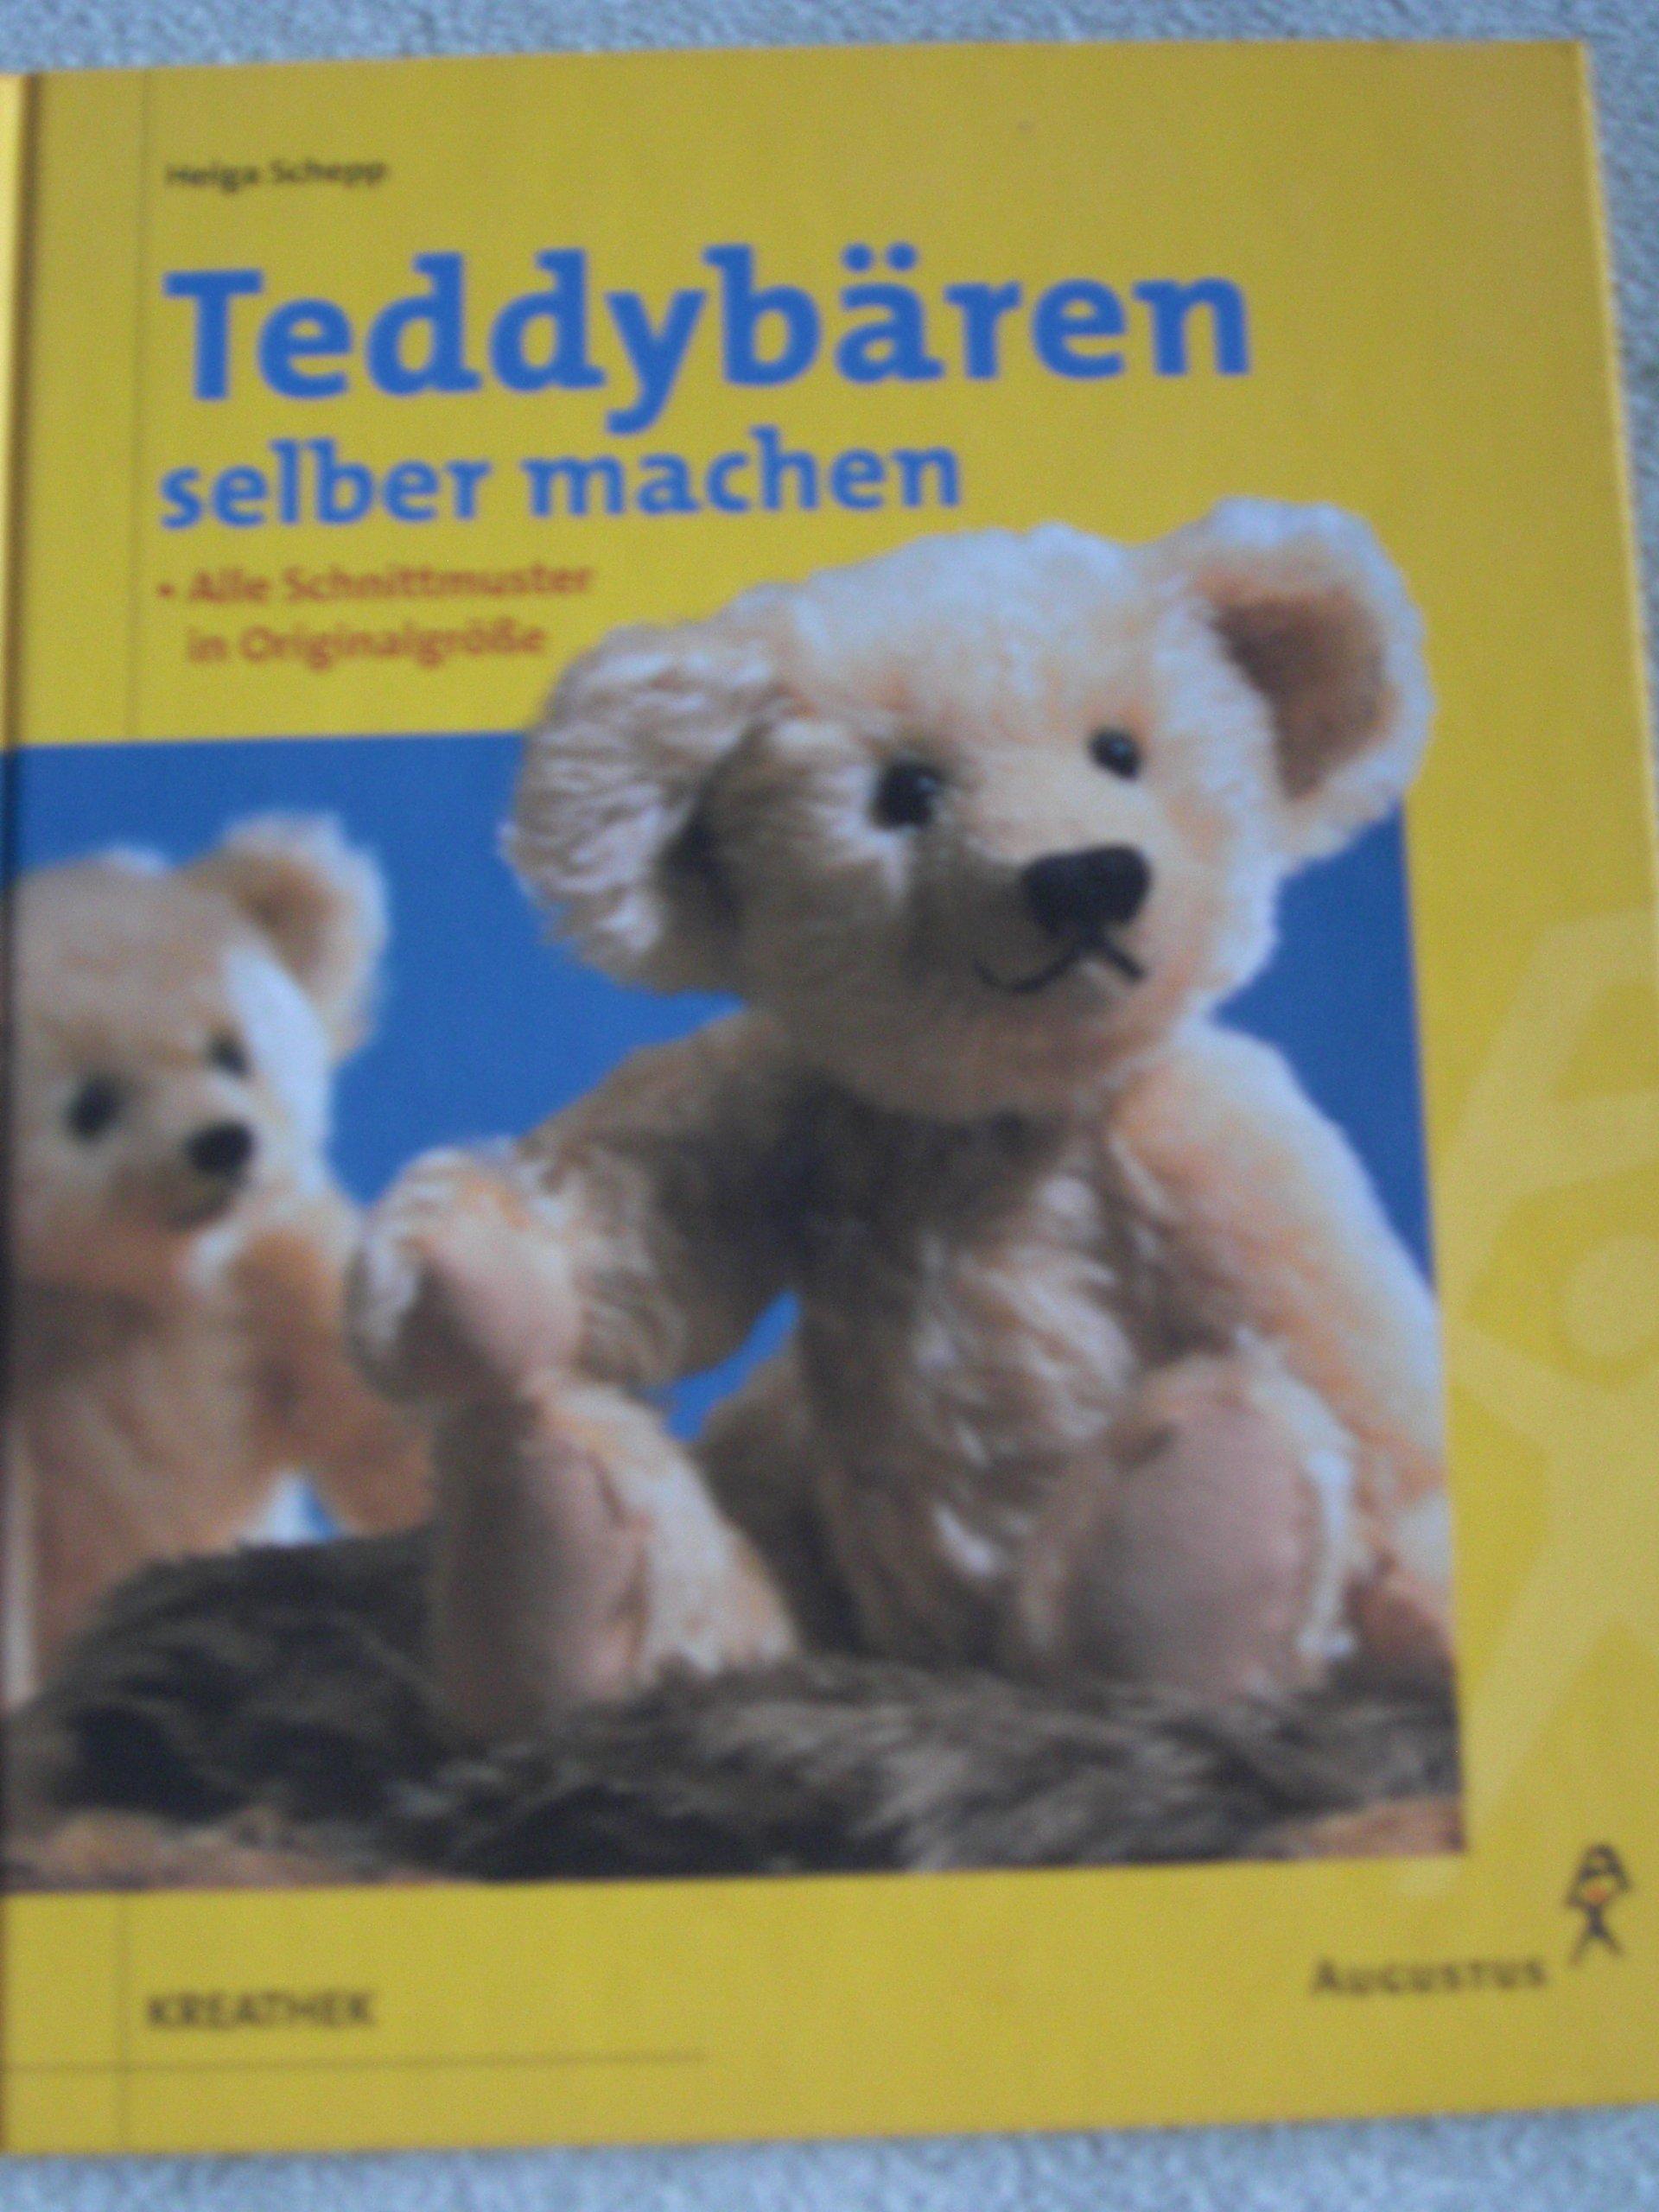 Teddybären selber machen: Amazon.de: Helga Schepp: Bücher